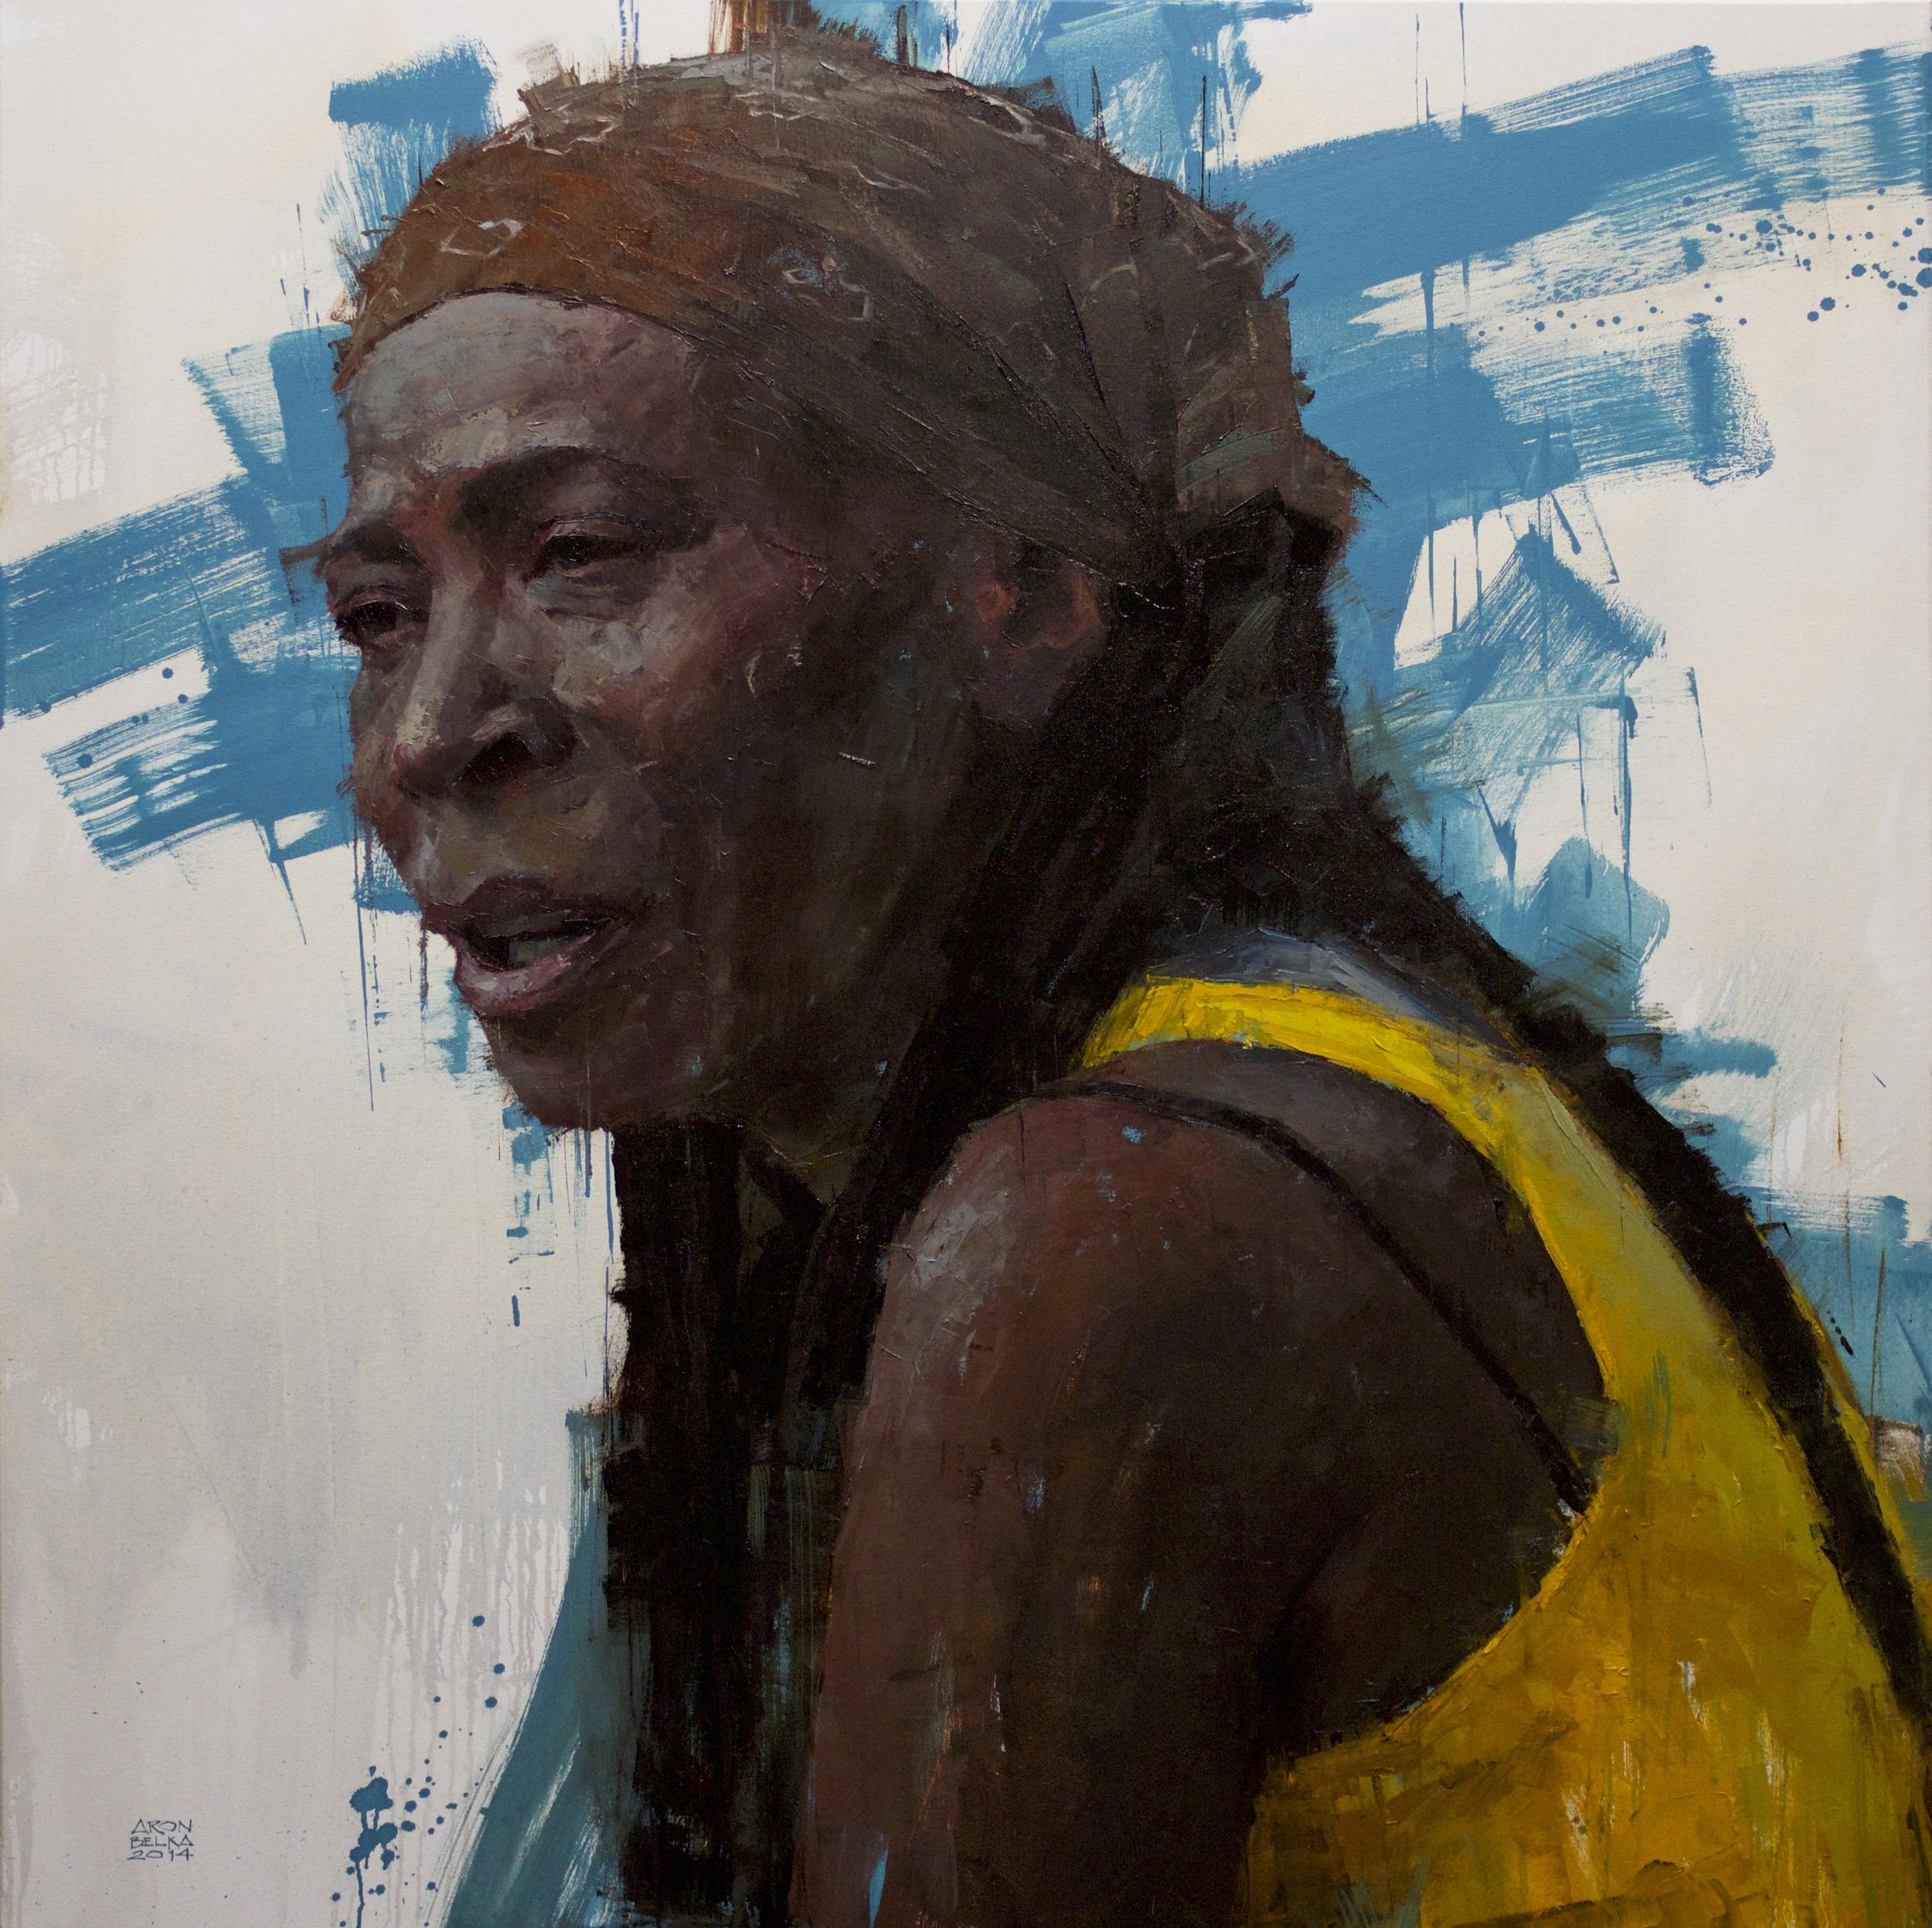 Rhythms     2014 48 x 48 inches oil on canvas